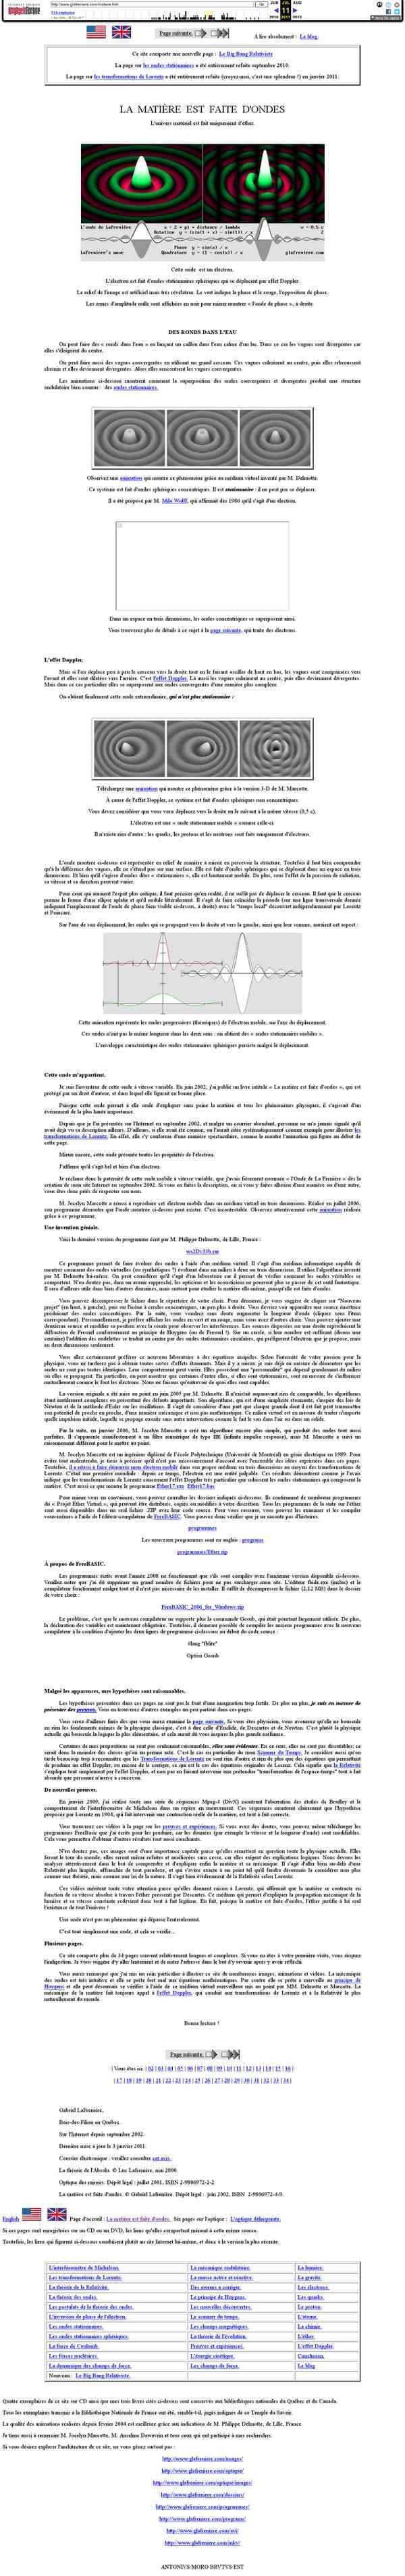 web.archive.org/web/20110711100519/http://www.glafreniere.com/matiere.htm